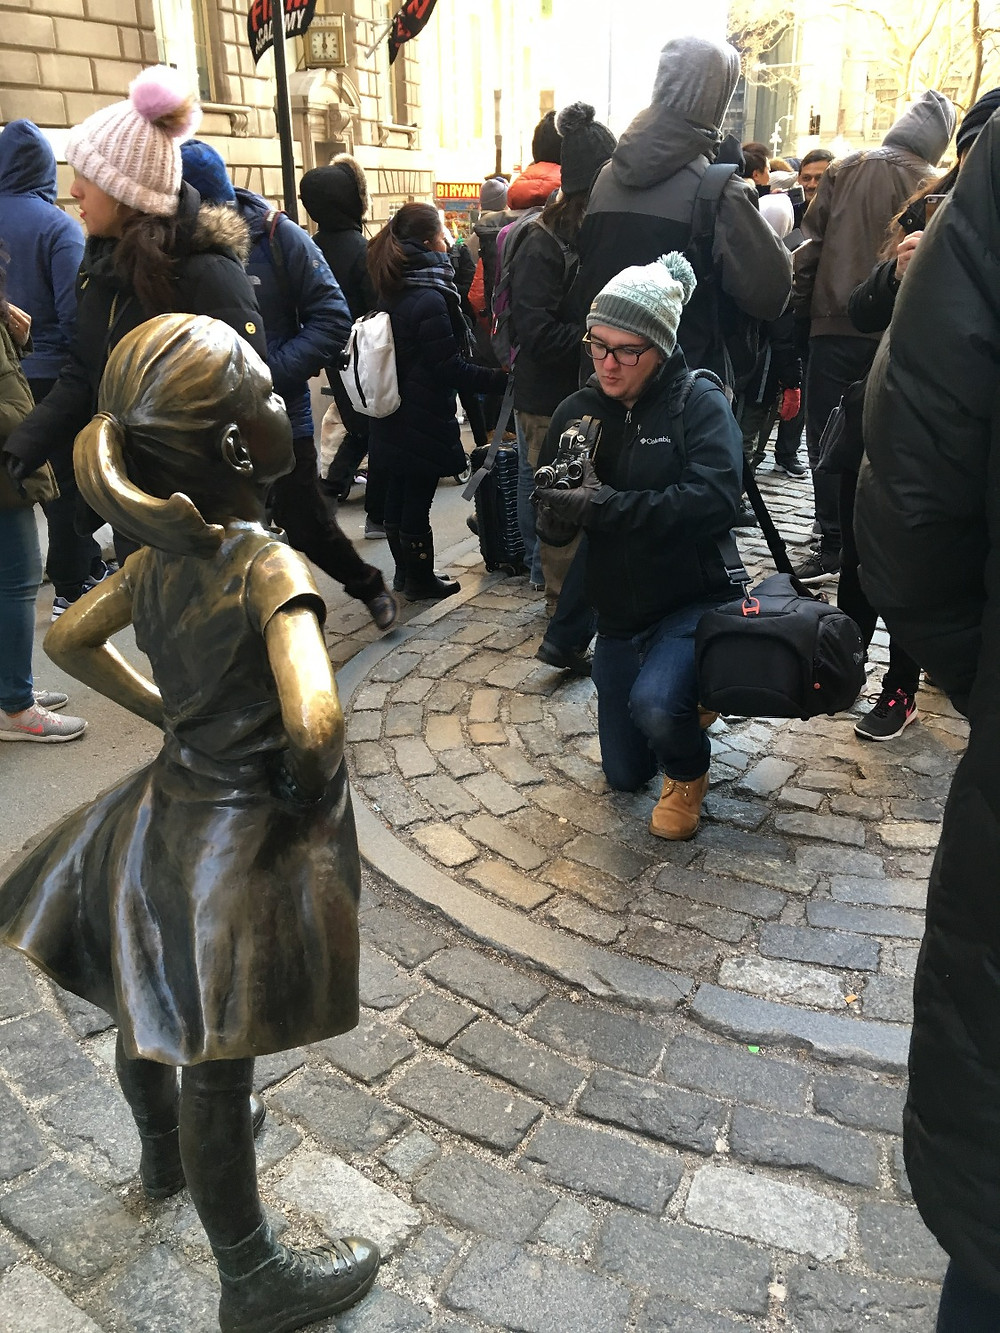 Blake Larson frames up a 16mm shot on Wall Street in New York